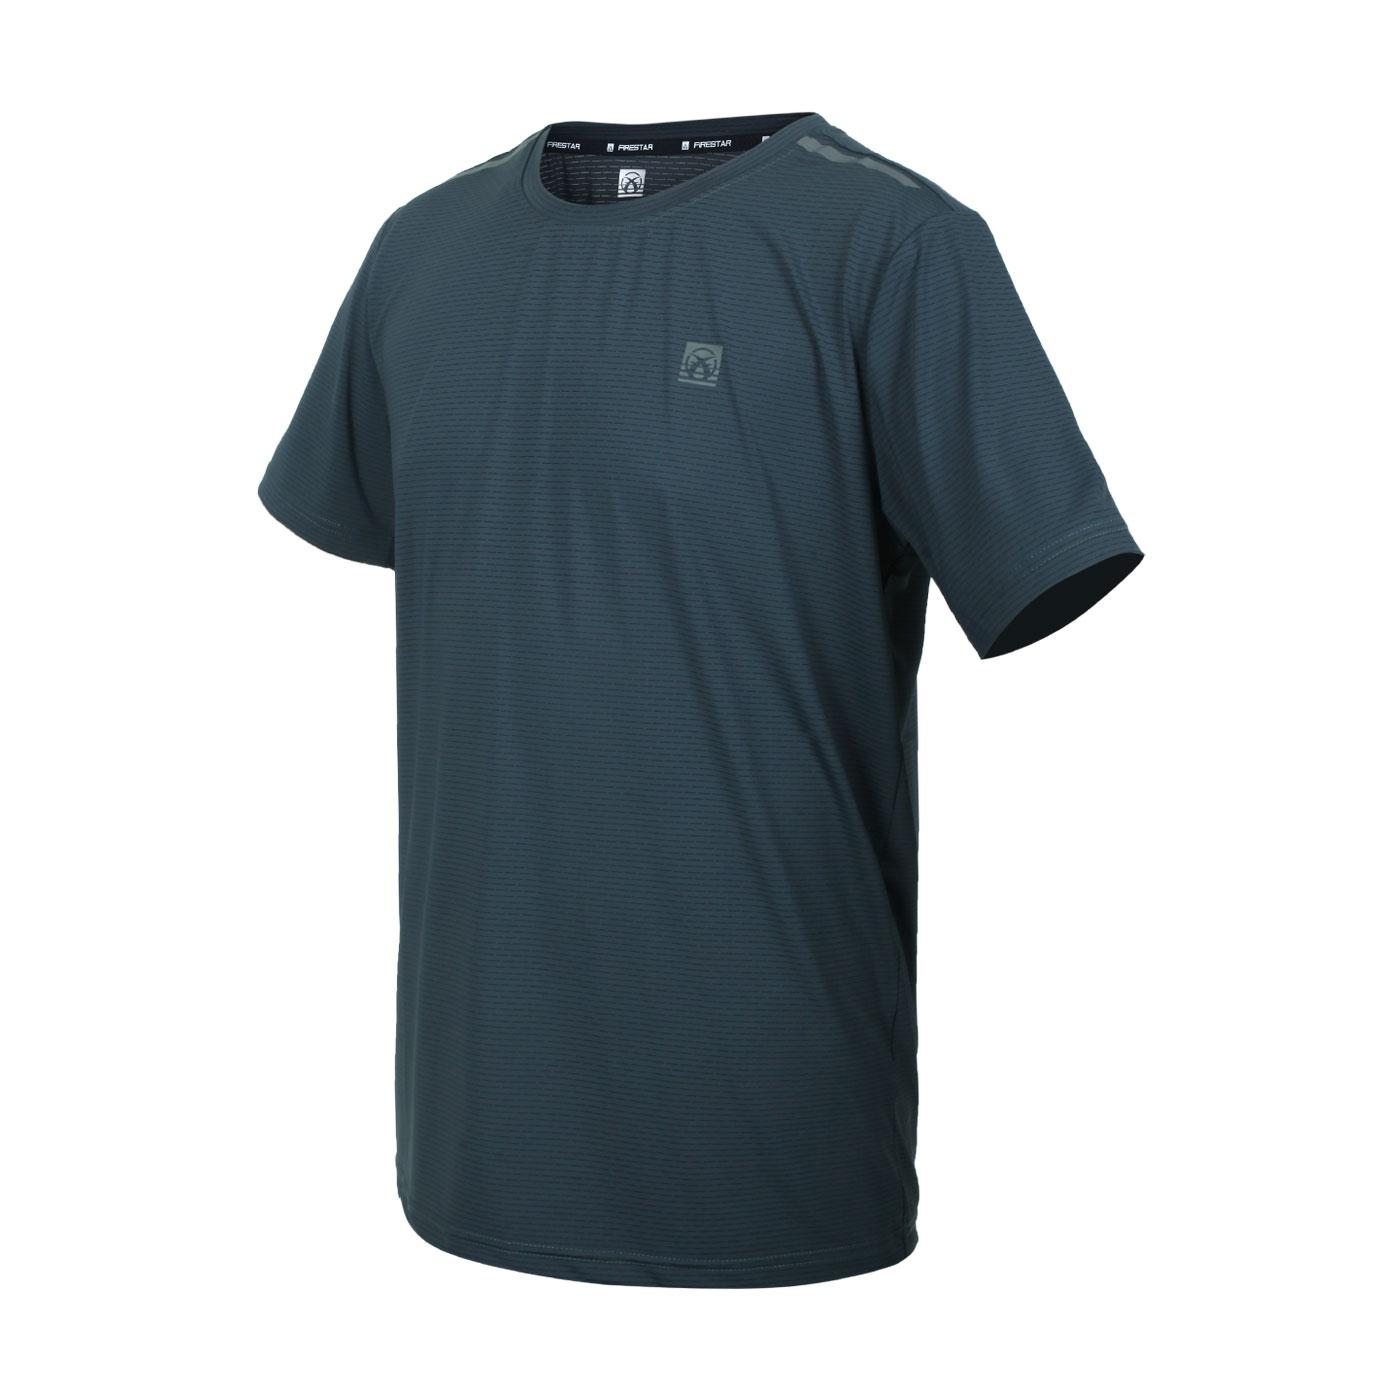 FIRESTAR 男款彈性機能圓領短袖T恤 D1732-16 - 灰綠銀